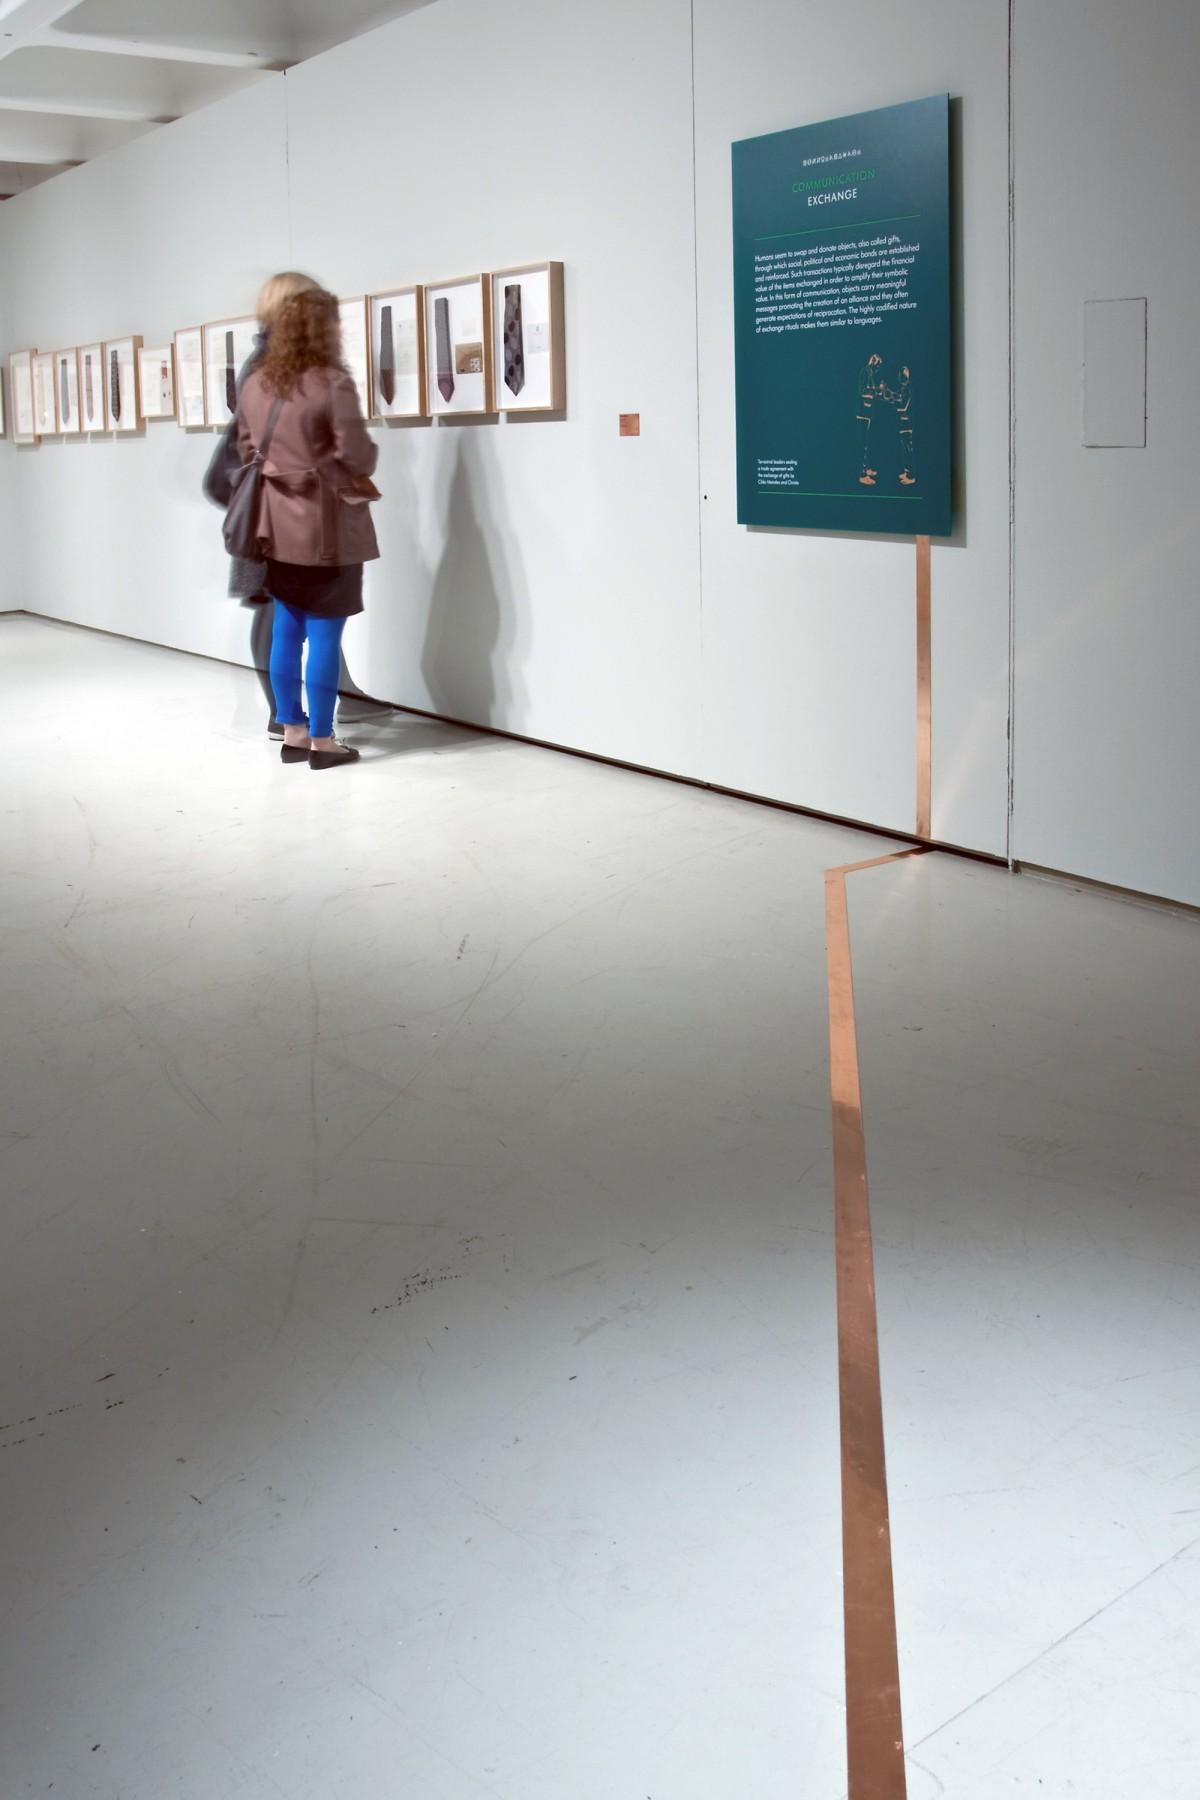 Martian-Museum-Terrestrial-art-Barbican-London-contemporary-design-exhibition-gallery-Jamie-Fobert-Architects-6